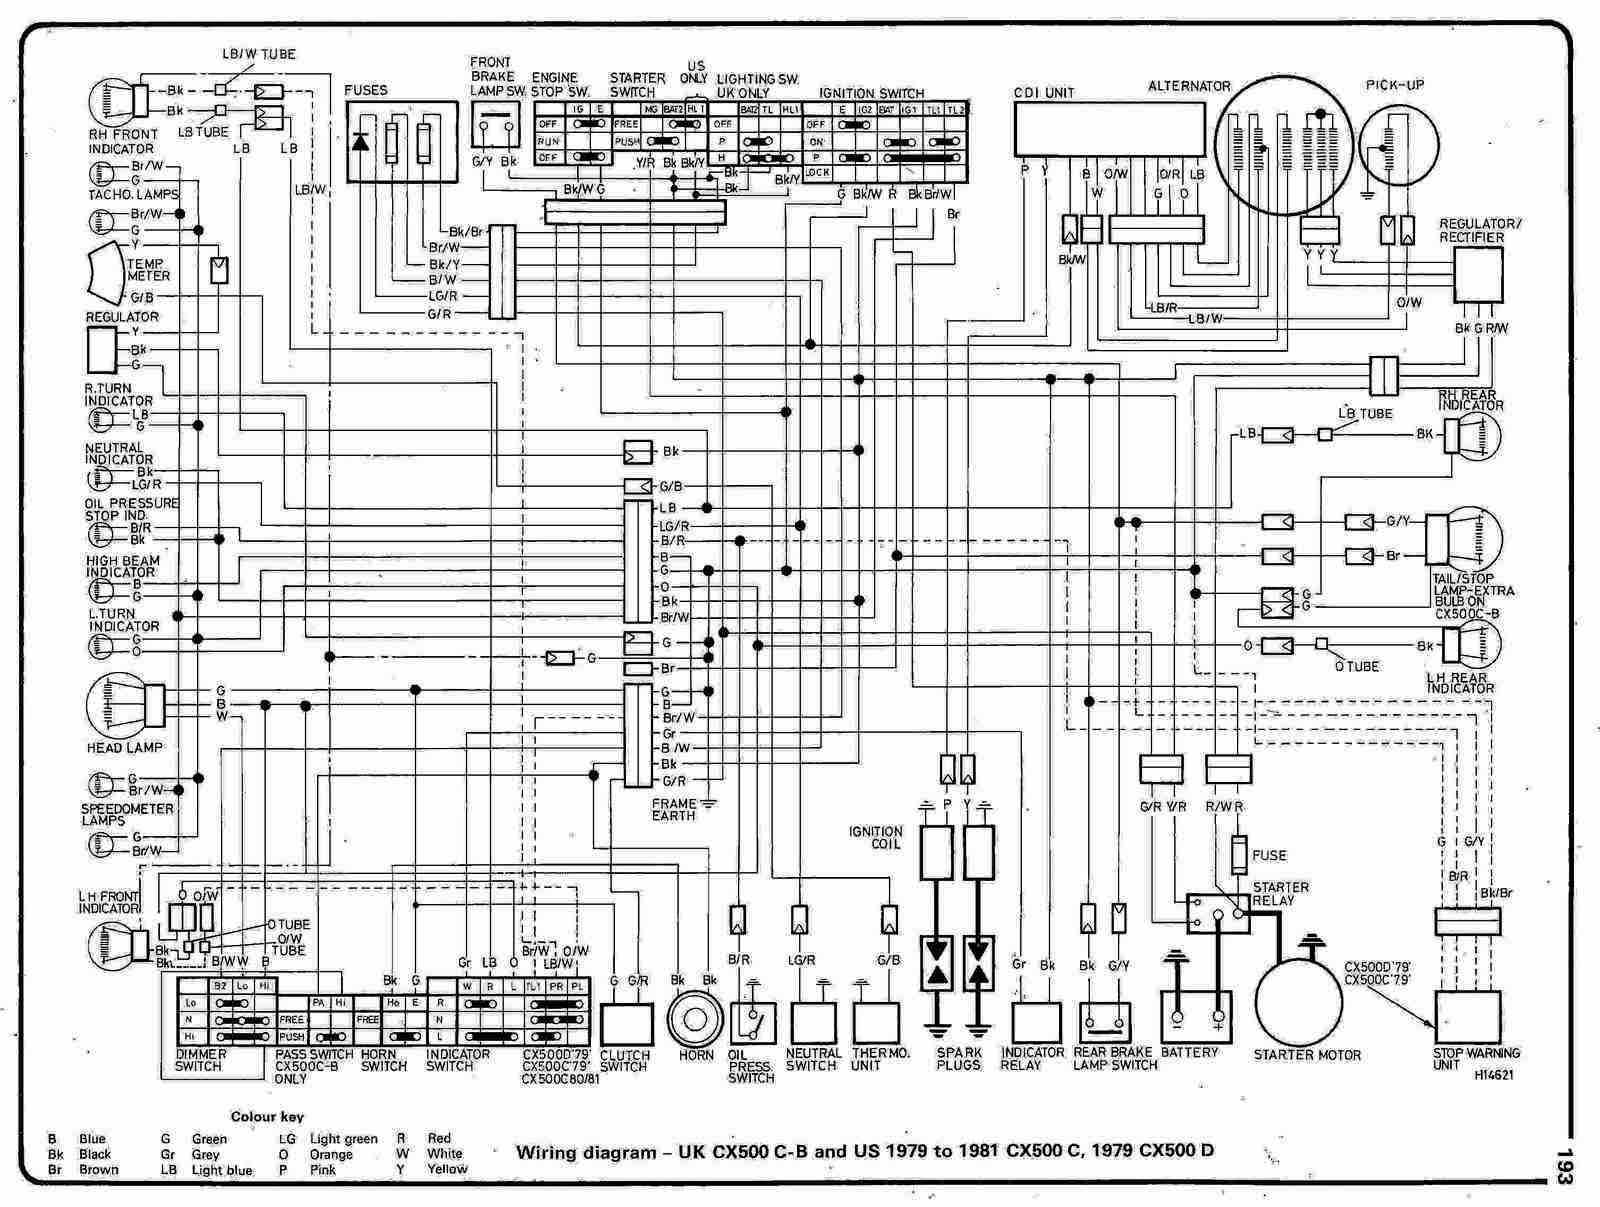 Honda Elite 80 Wiring Diagram Color O2 Sensor 89 125 Sabre Sailboat On